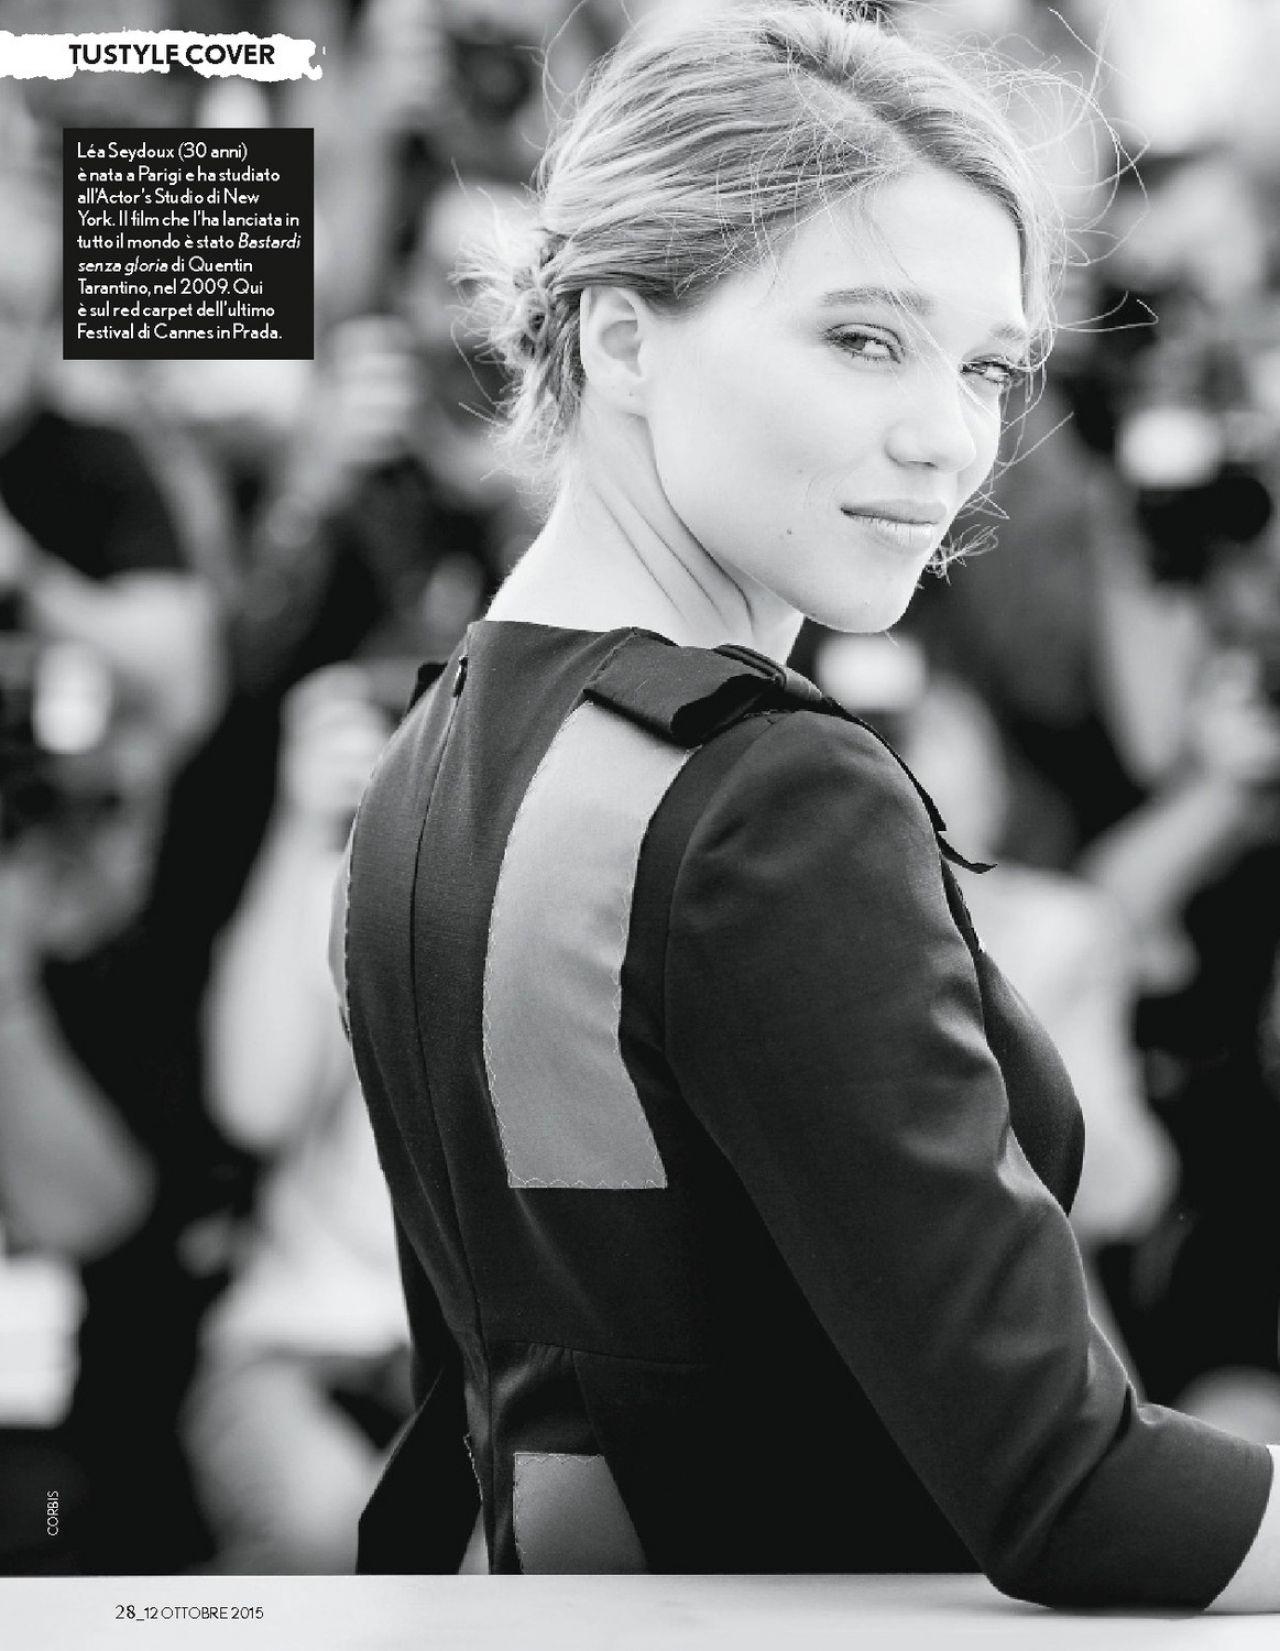 Tustyle Magazine November 2015 Issue: Lea Seydoux Latest Photos